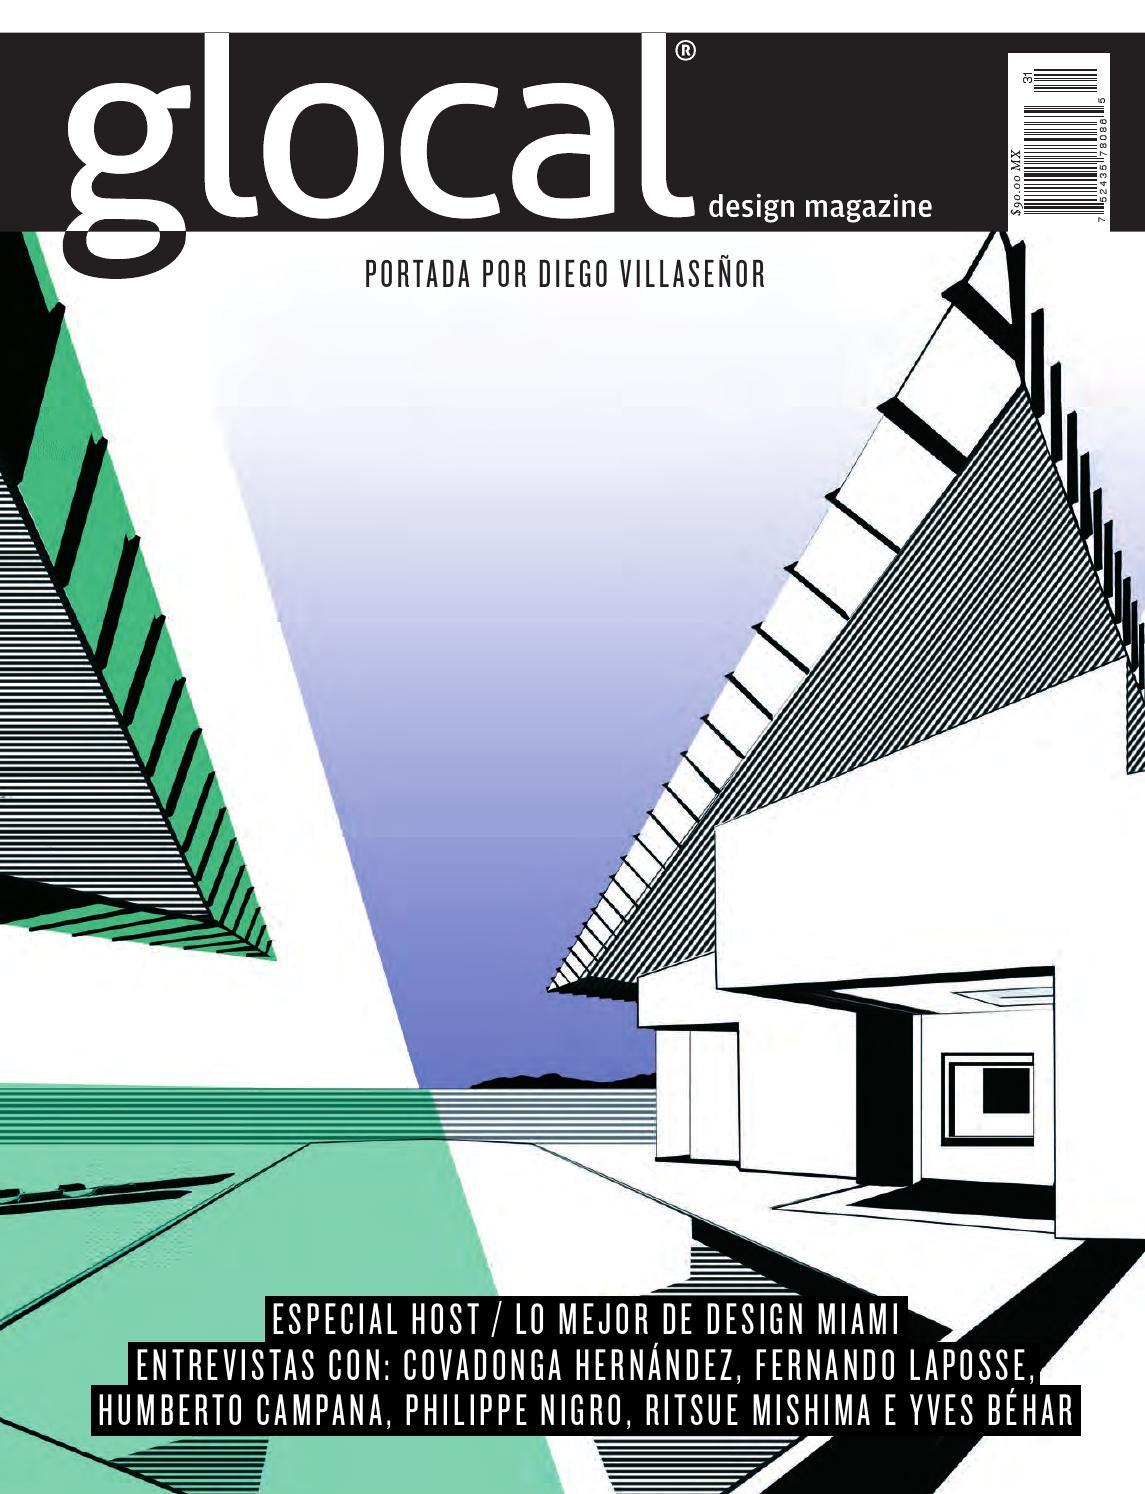 brand new 3ee43 004e4 GLOCAL DESIGN MAGAZINE No. 31 Portada por   Cover by  DIEGO VILLASEÑOR by  GLOCAL DESIGN MAGAZINE - issuu